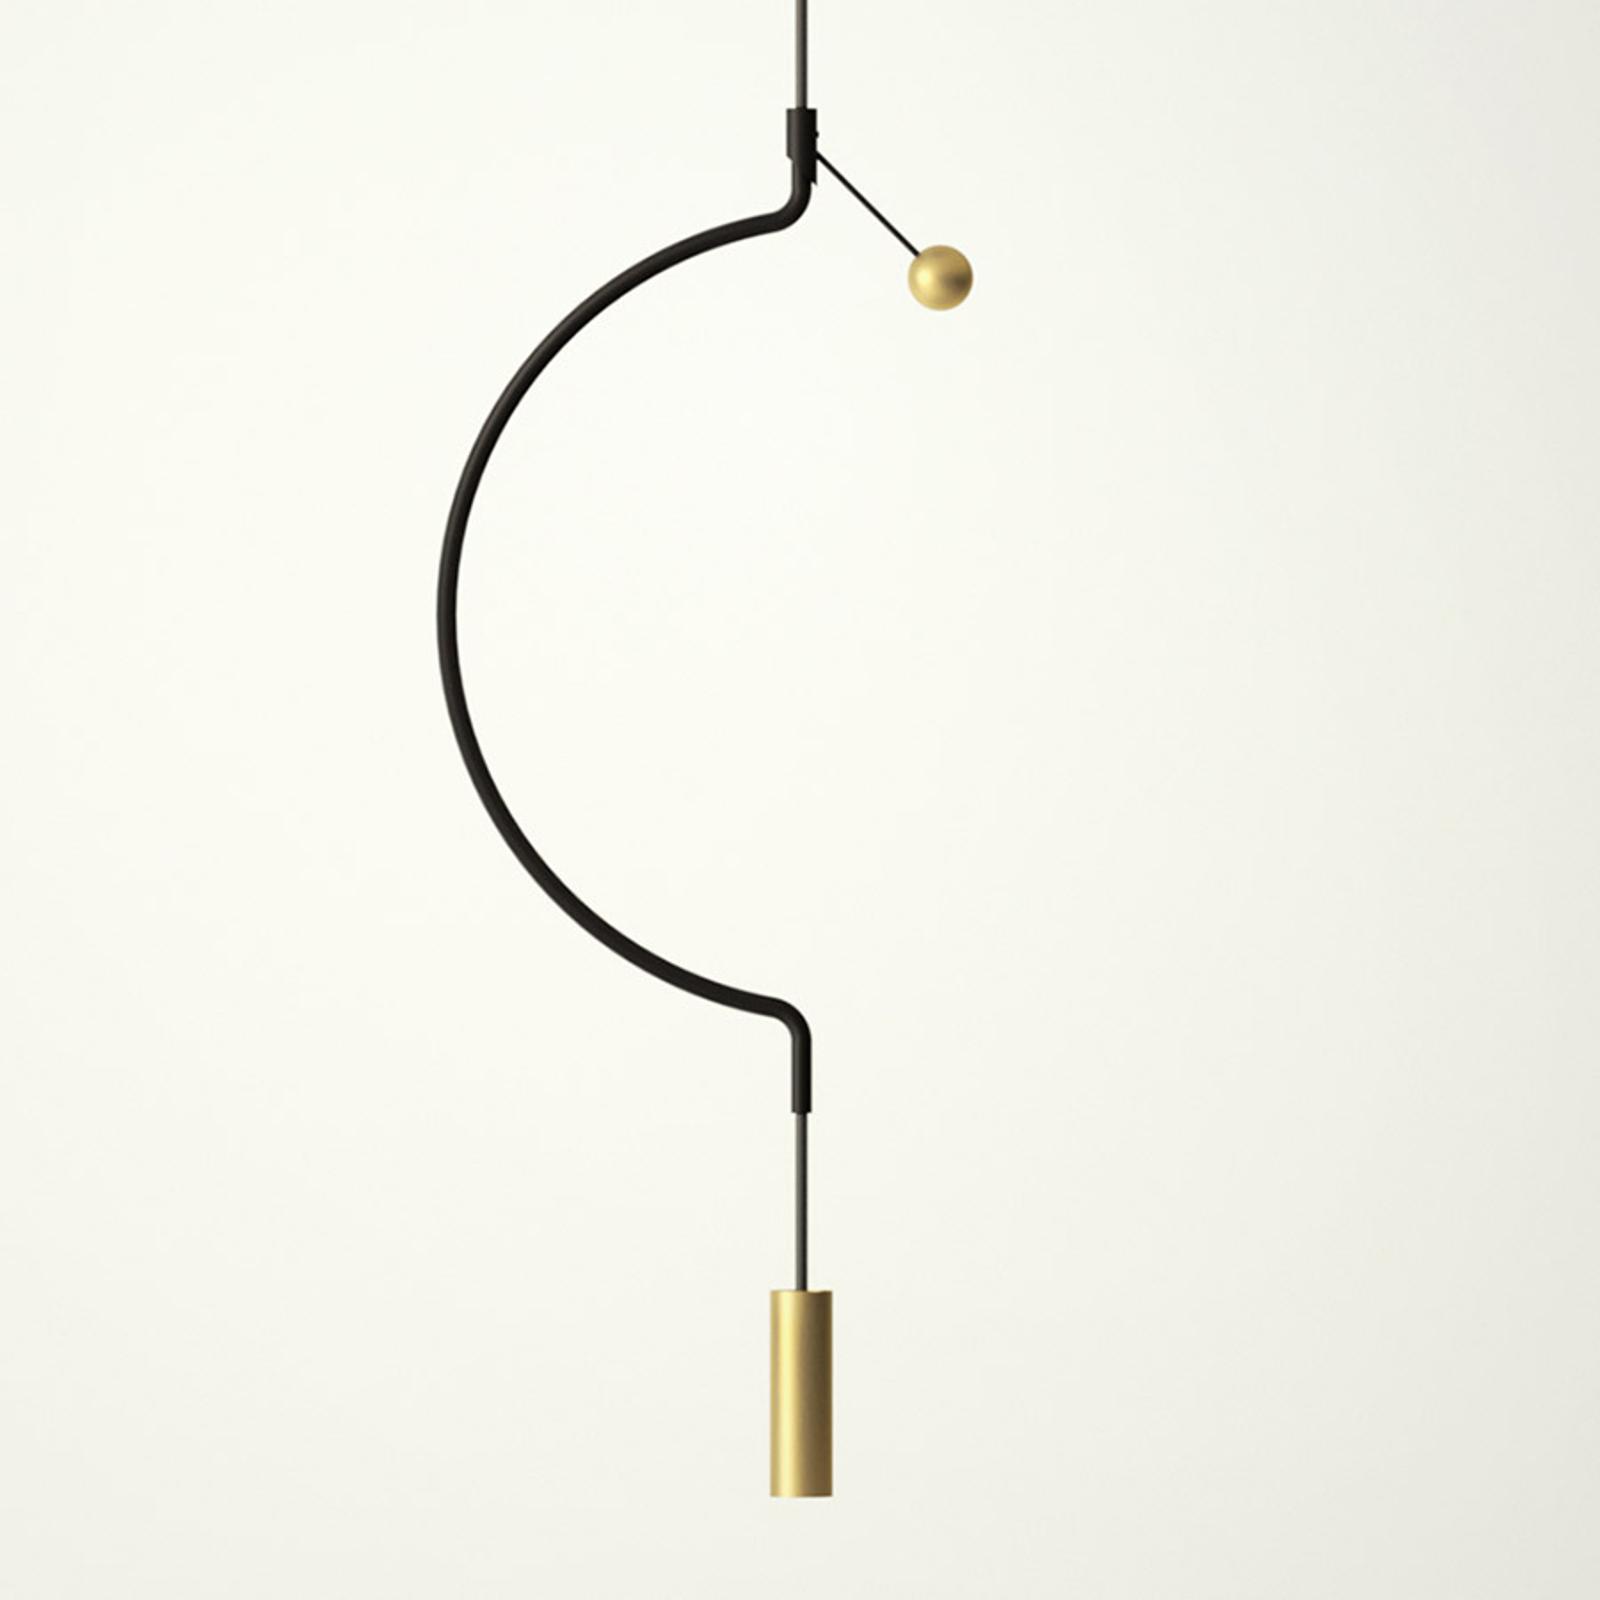 Axolight Liaison P1 pendellampe svart/gull 32 cm